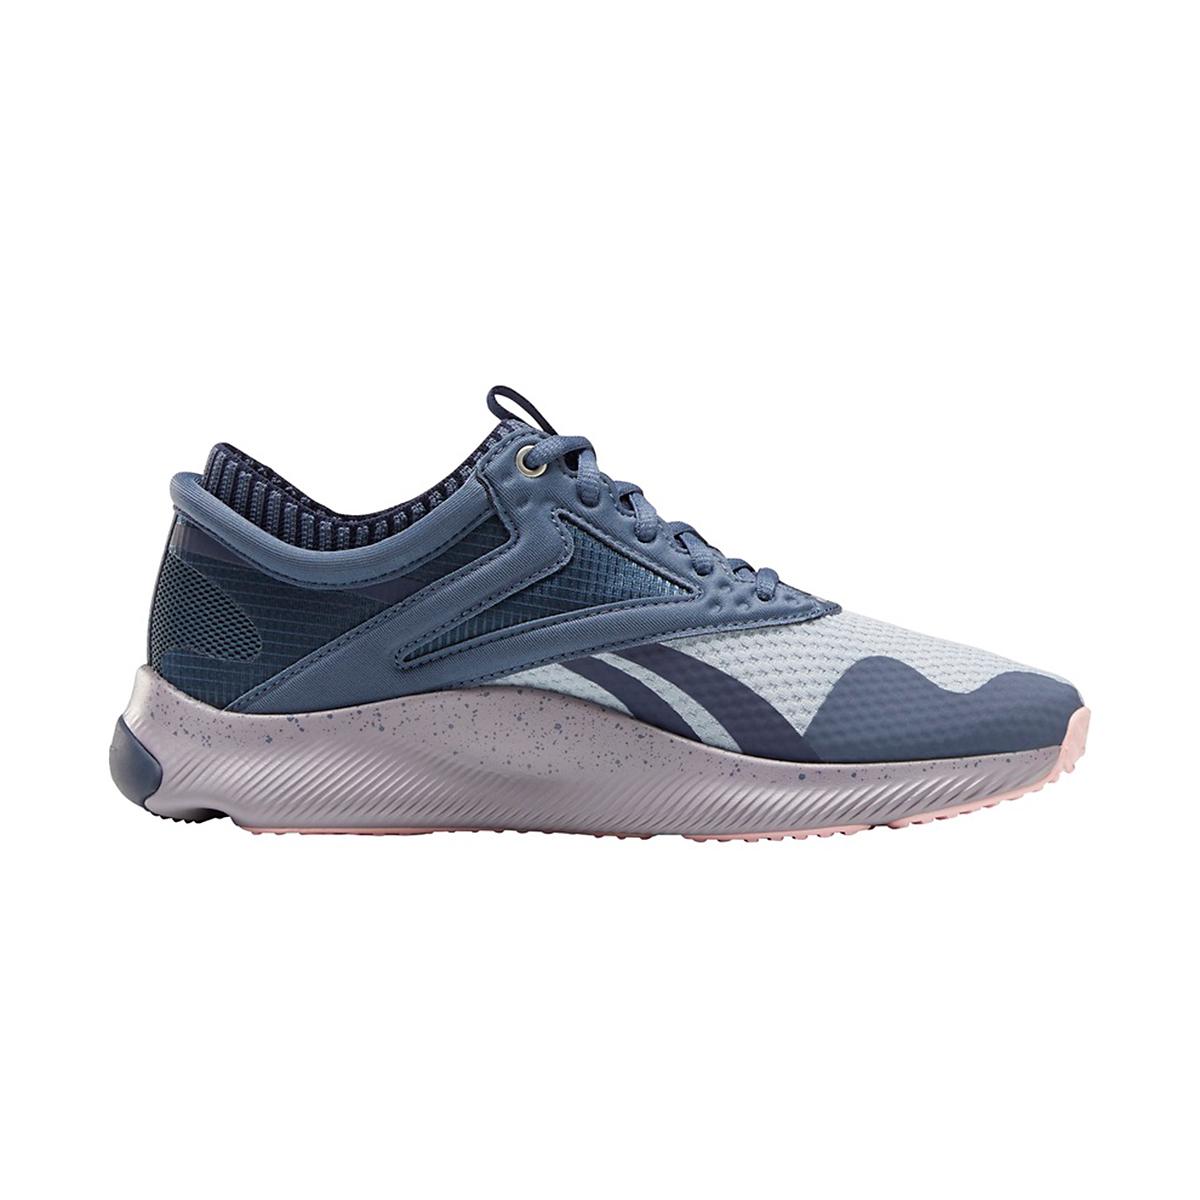 Women's Reebok HIIT Training Shoe - Color: Smoky Indigo/Meteor Grey/White - Size: 5 - Width: Regular, Smoky Indigo/Meteor Grey/White, large, image 1